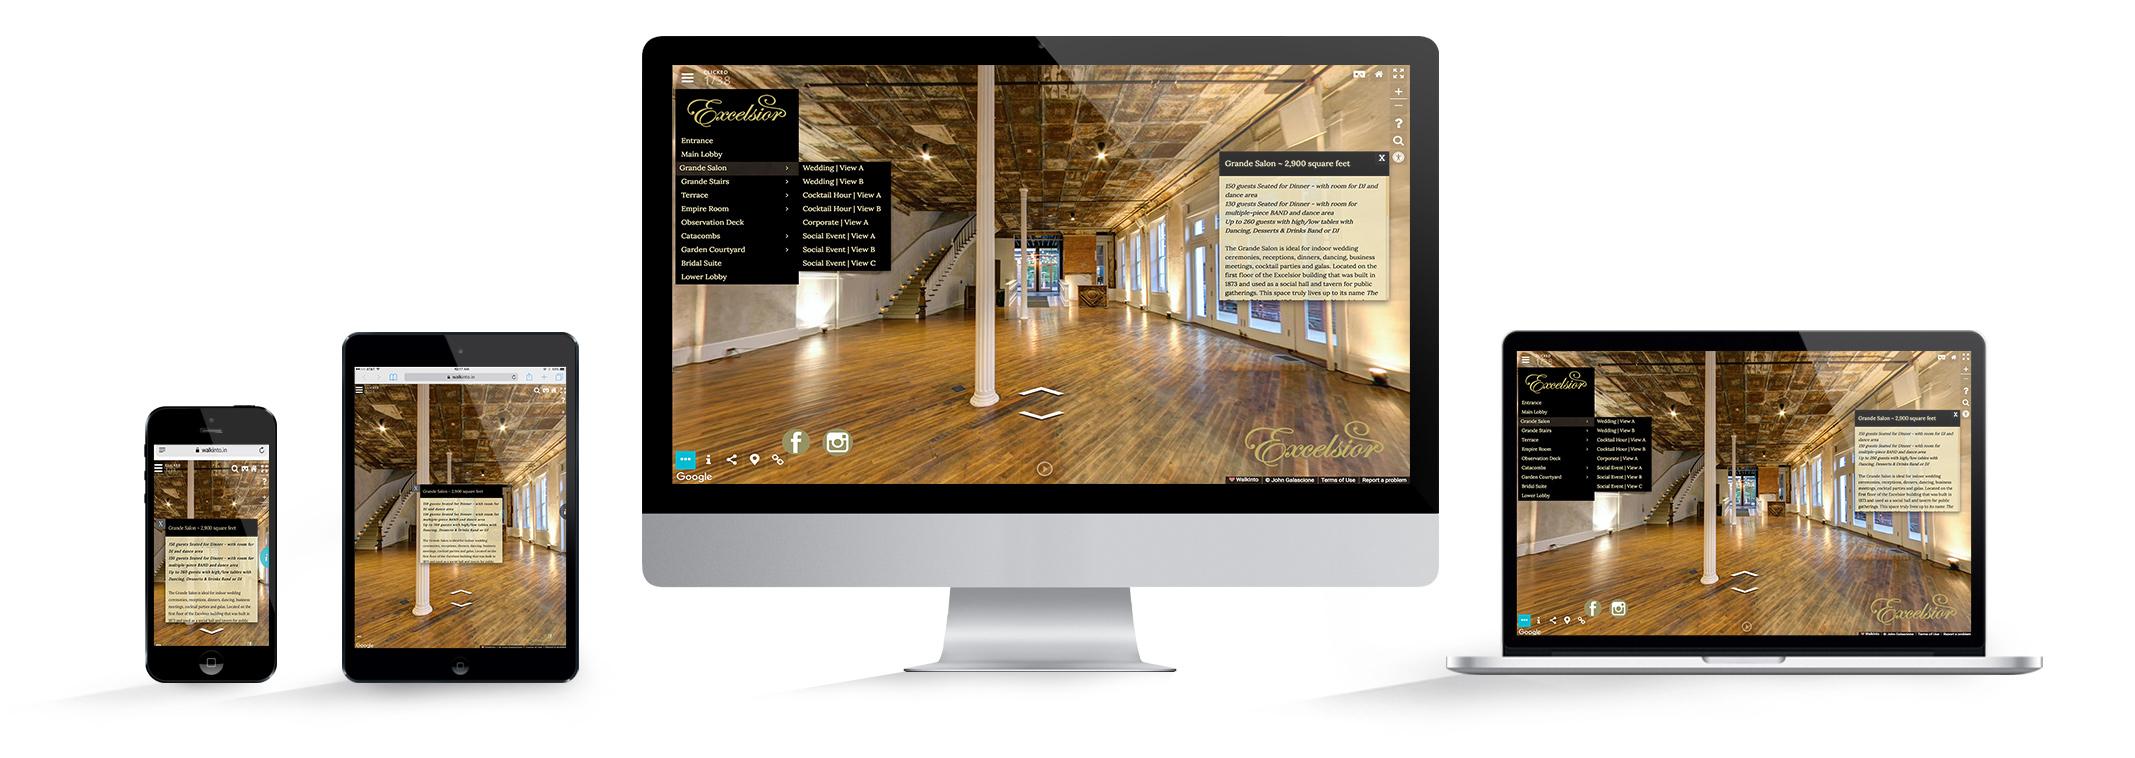 NEWbranding-screenmockups-Excelsior1.jpg